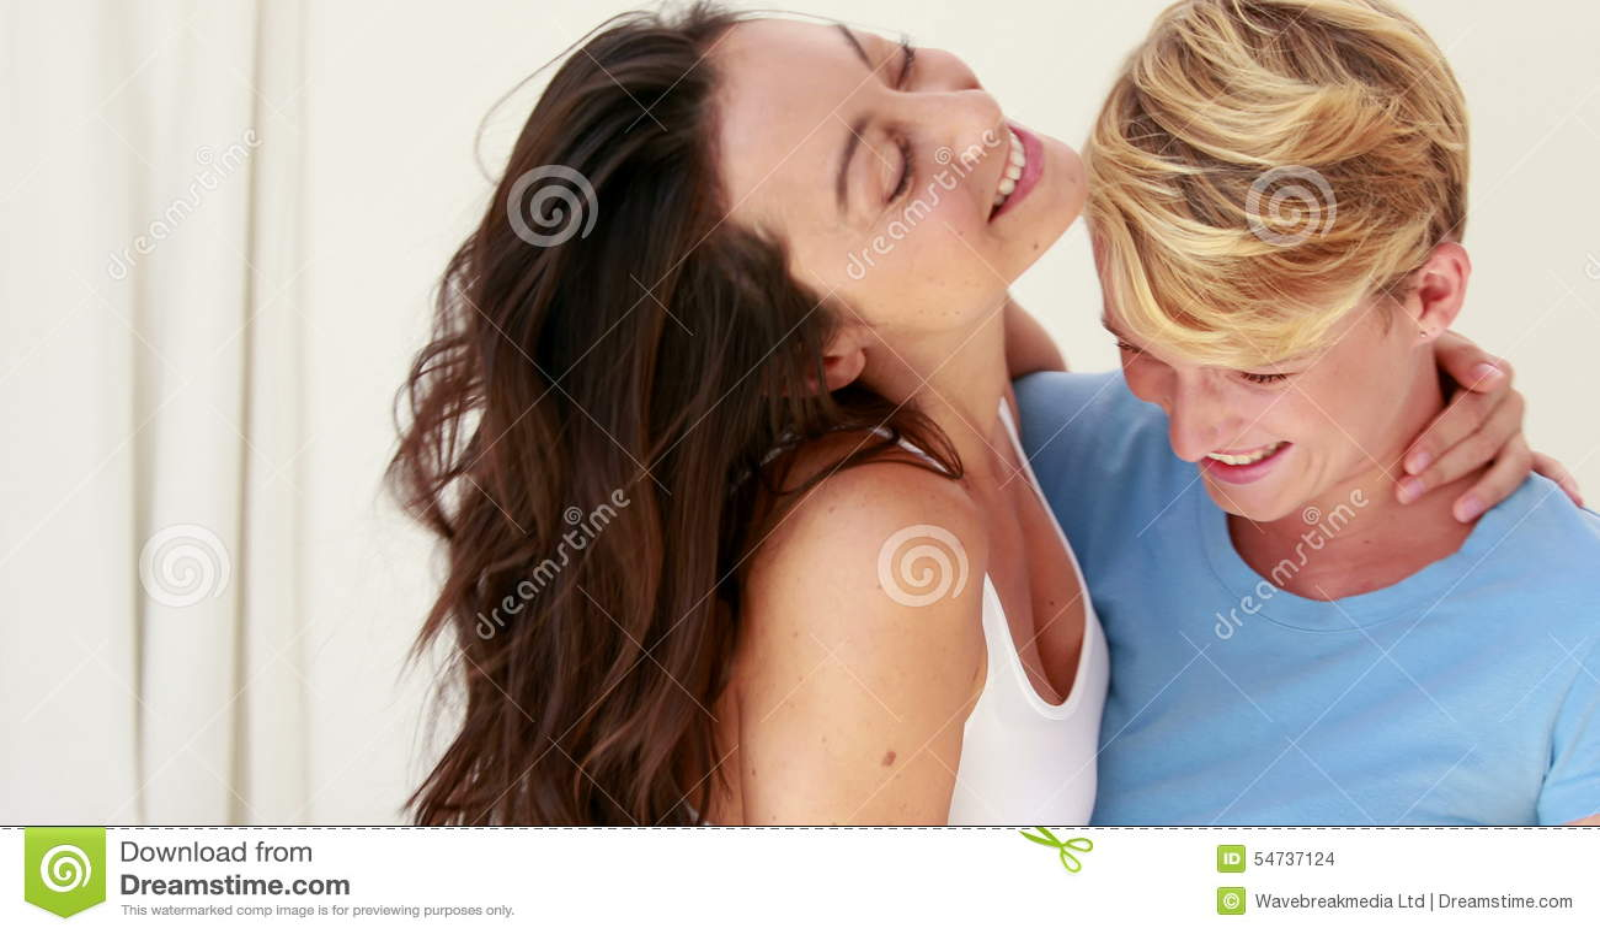 Lesbian having fun on bed